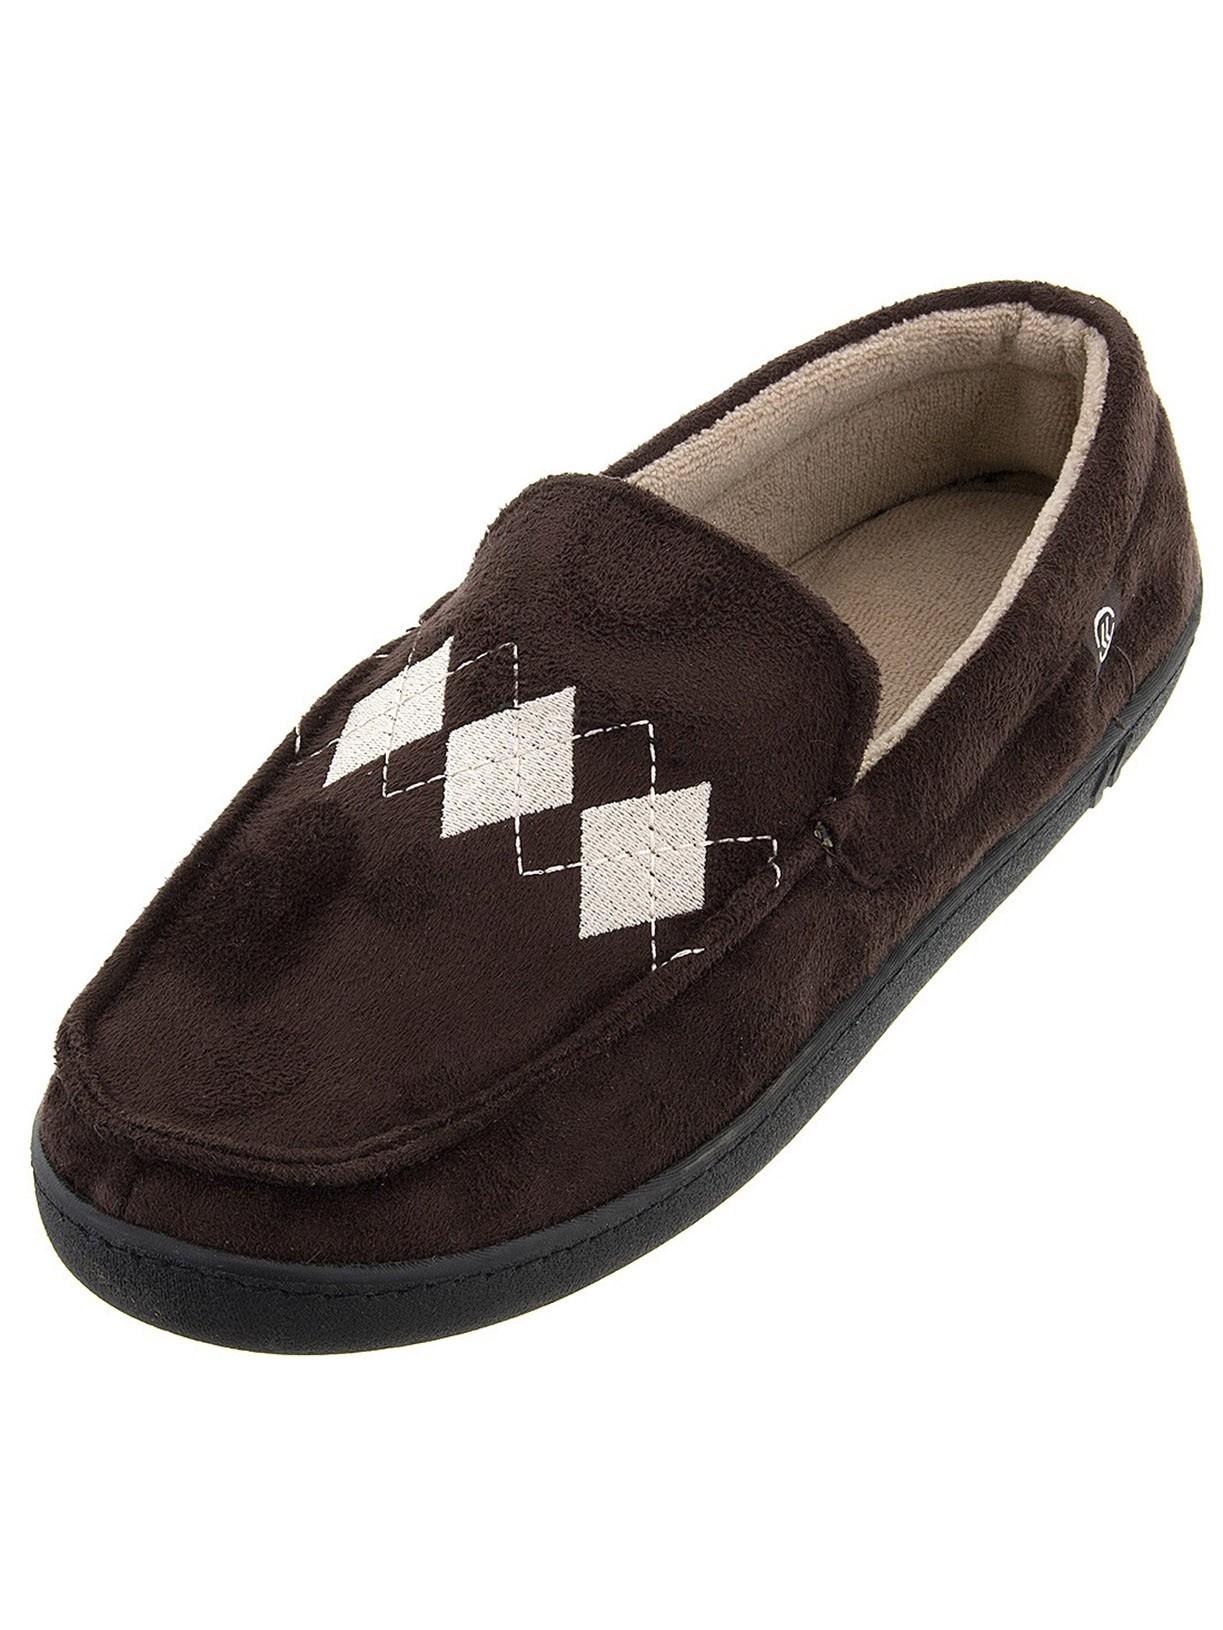 Isotoner signature also men   chocolate moccasin slipper rh walmart